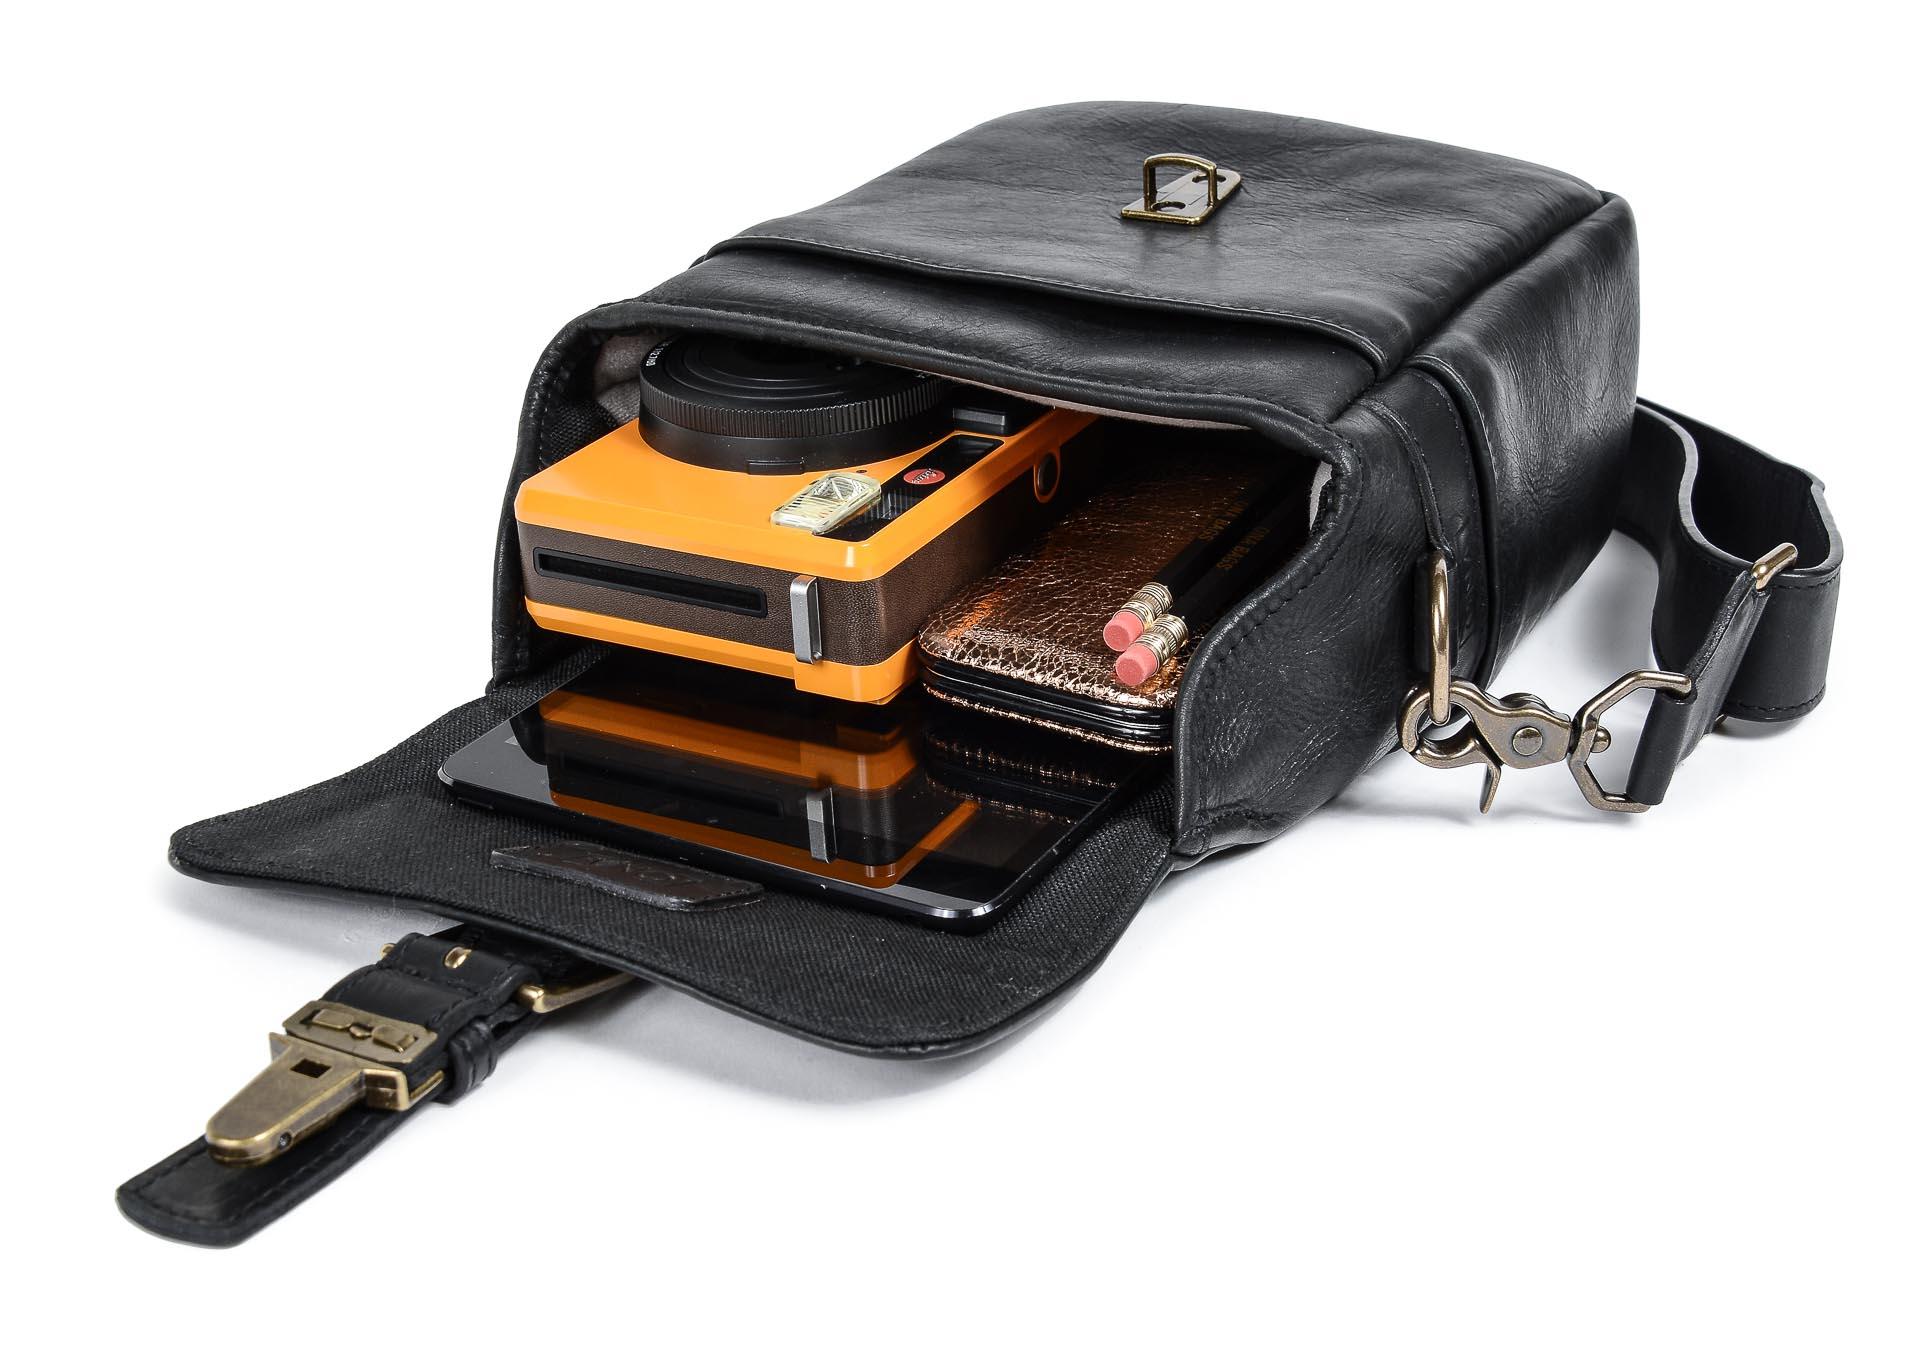 b810e0ac6d ONA Bag - Bond Street Black Leather - Graphicart Produkte und ...